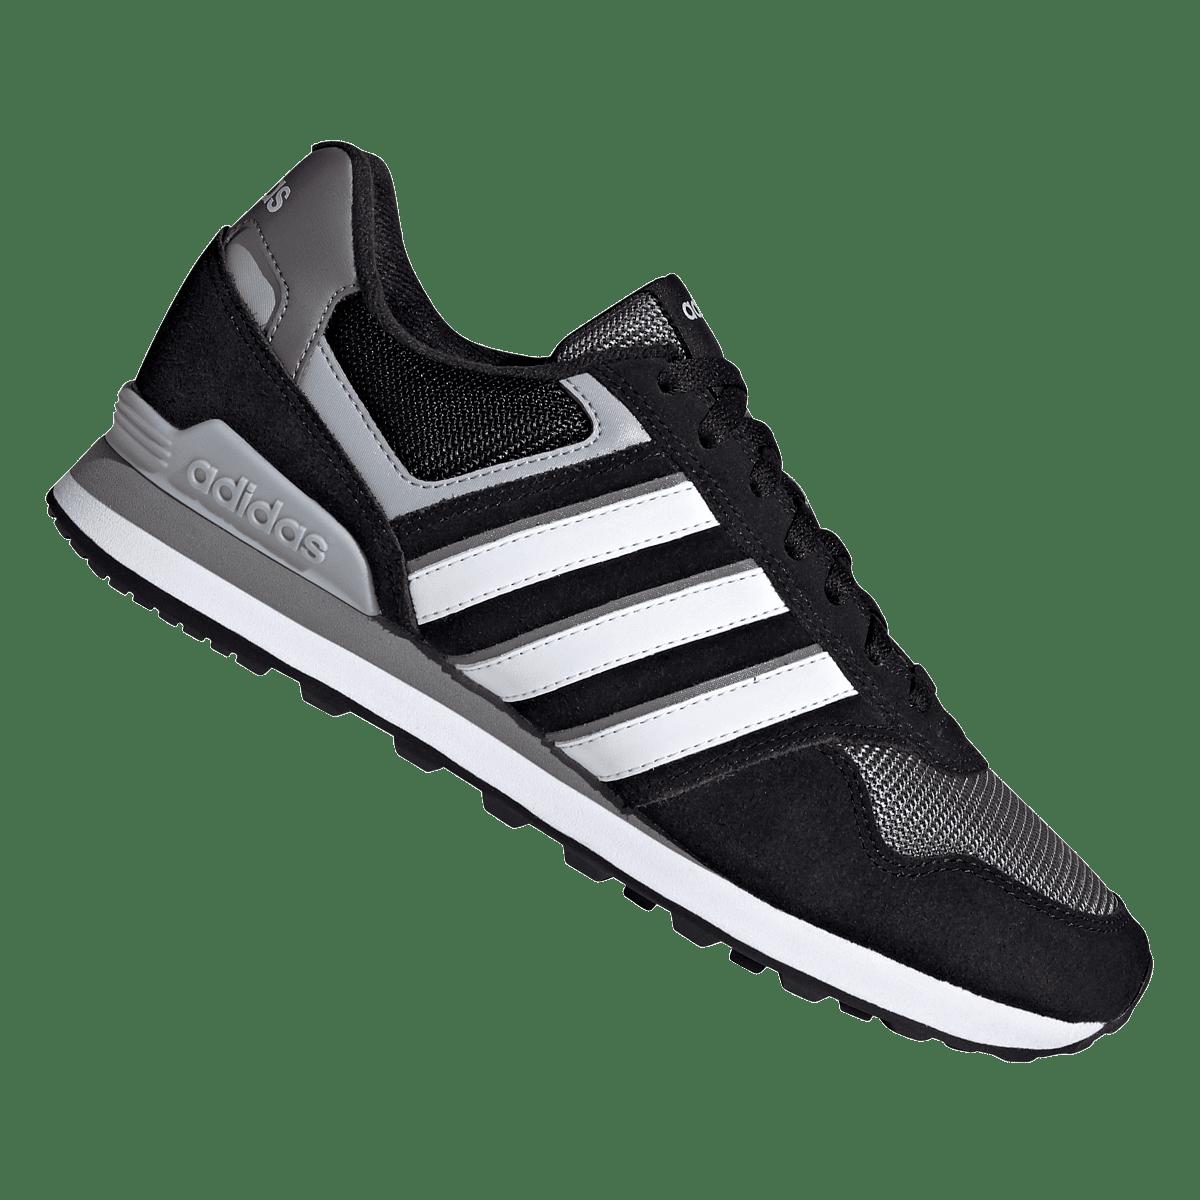 Chaussures de loisirs adidas 10K noir/blanc